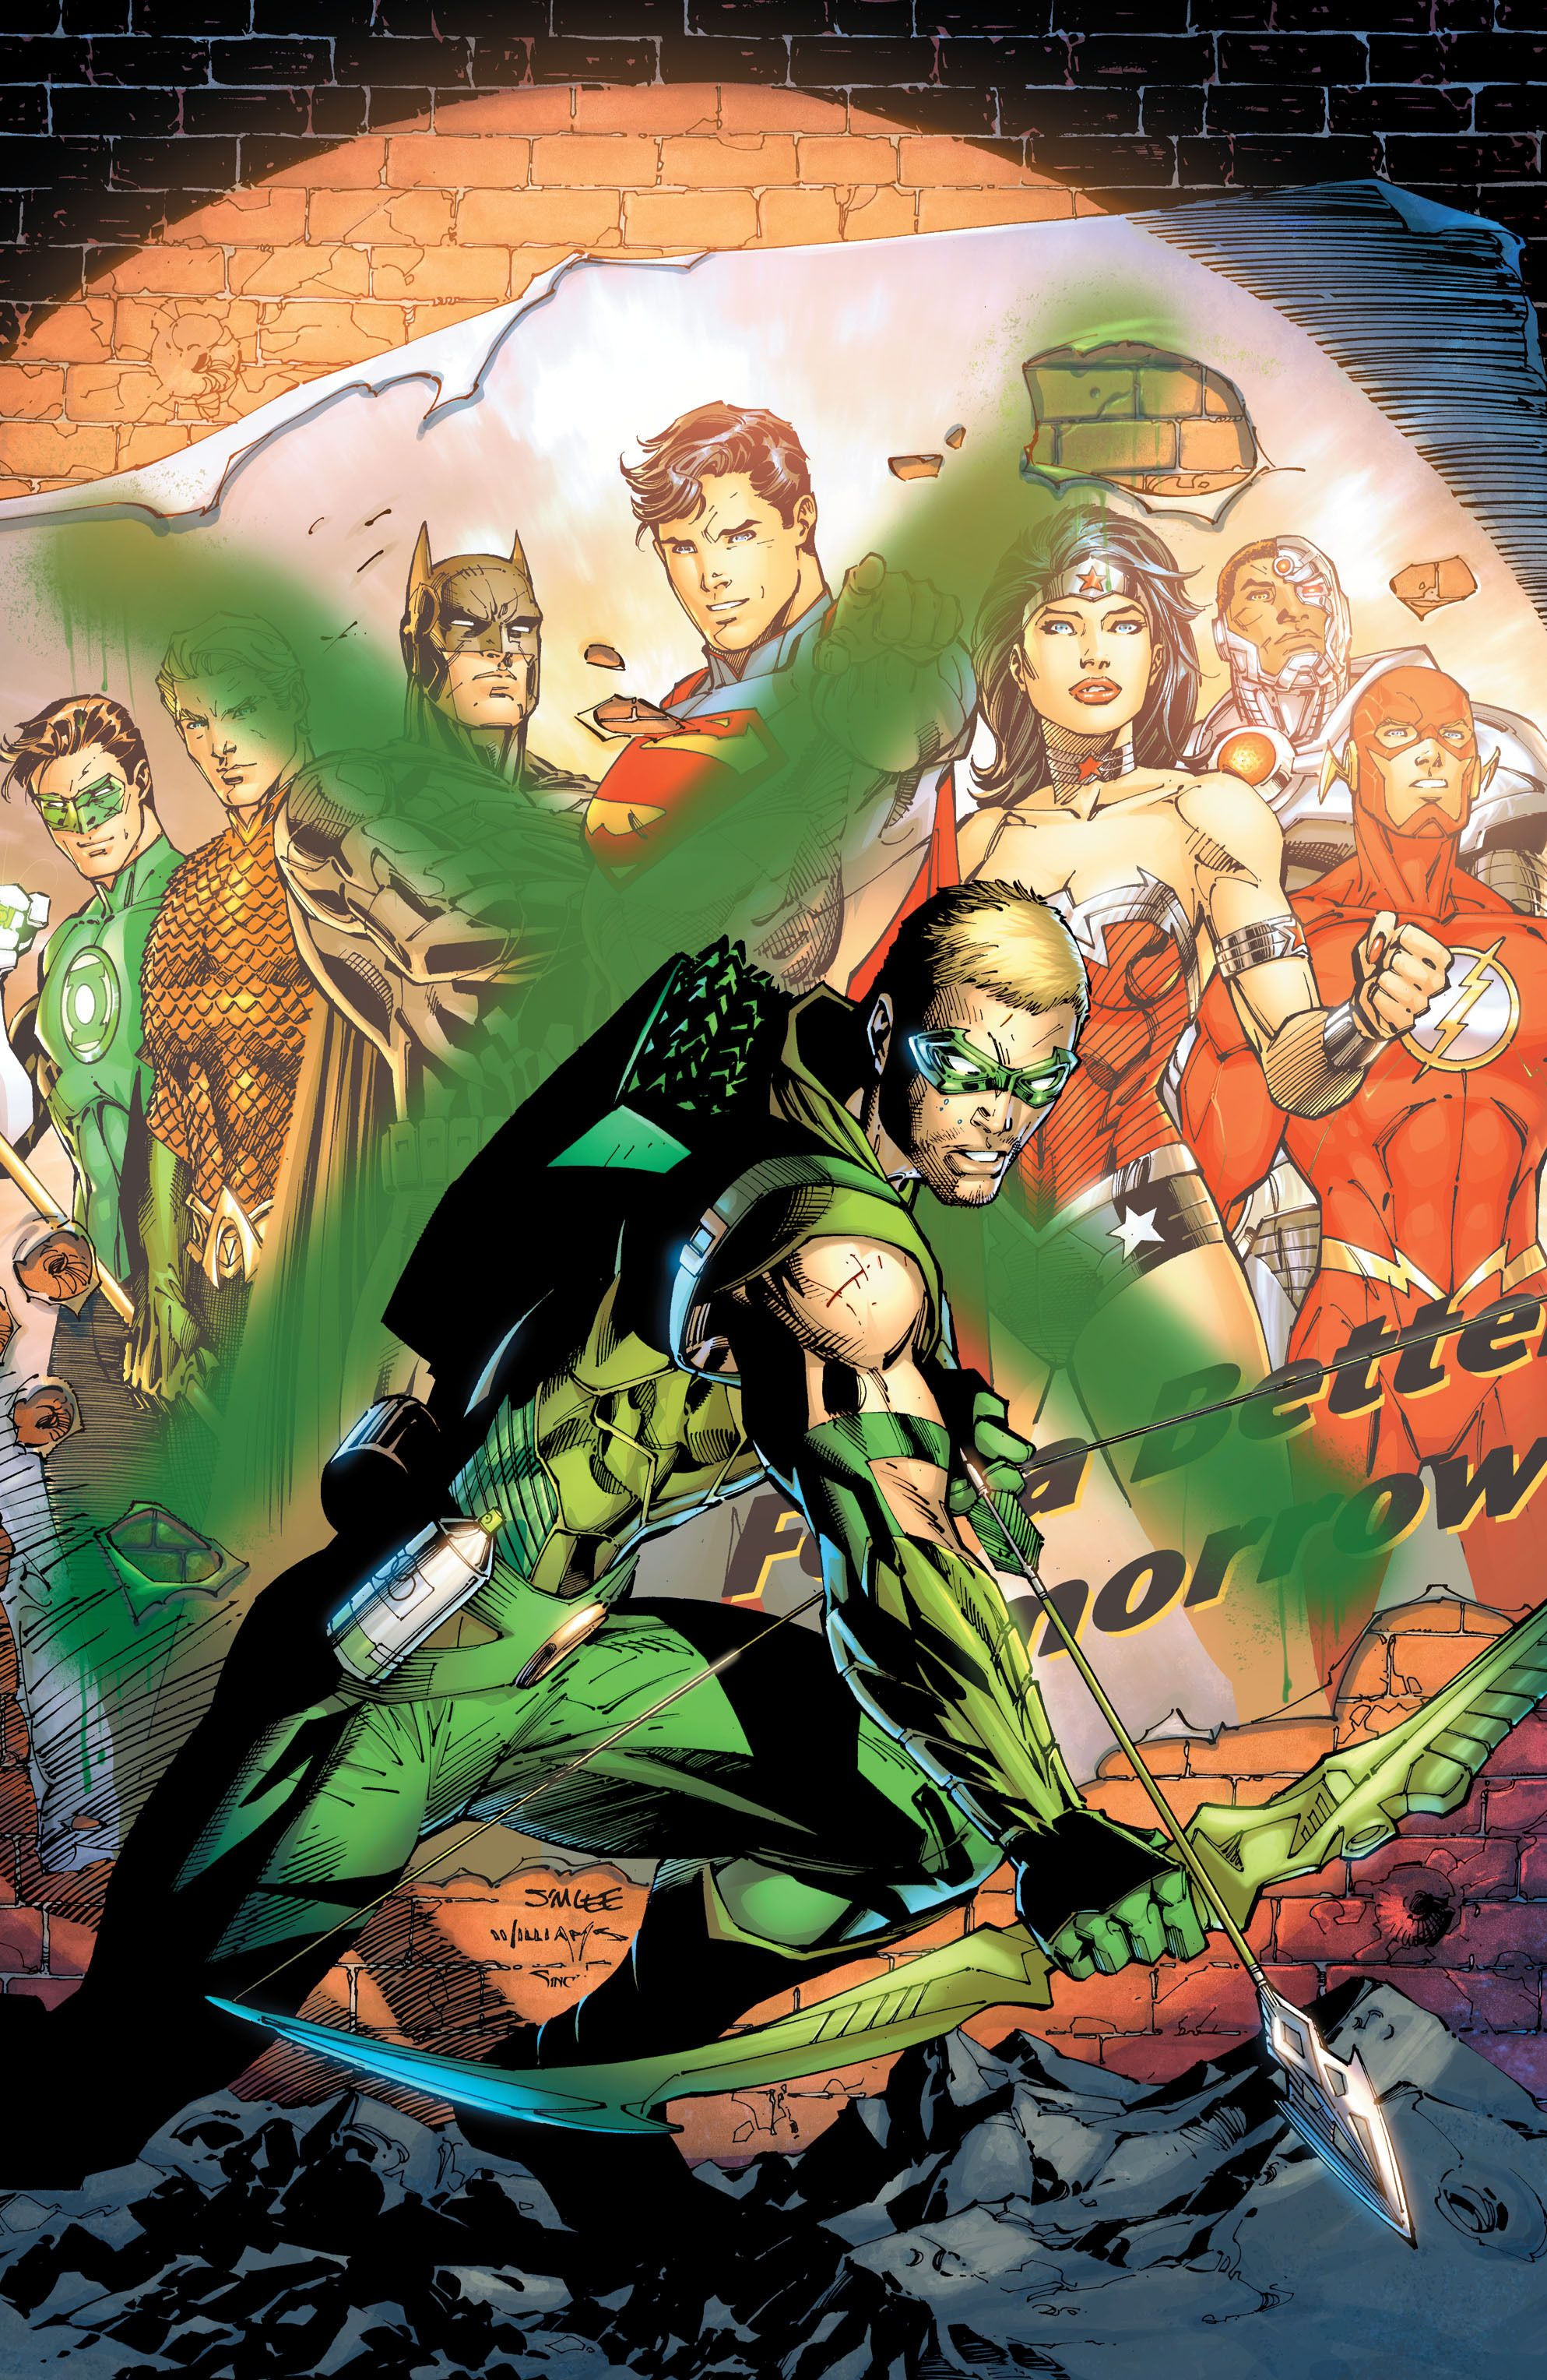 Green Arrow by Jim Lee